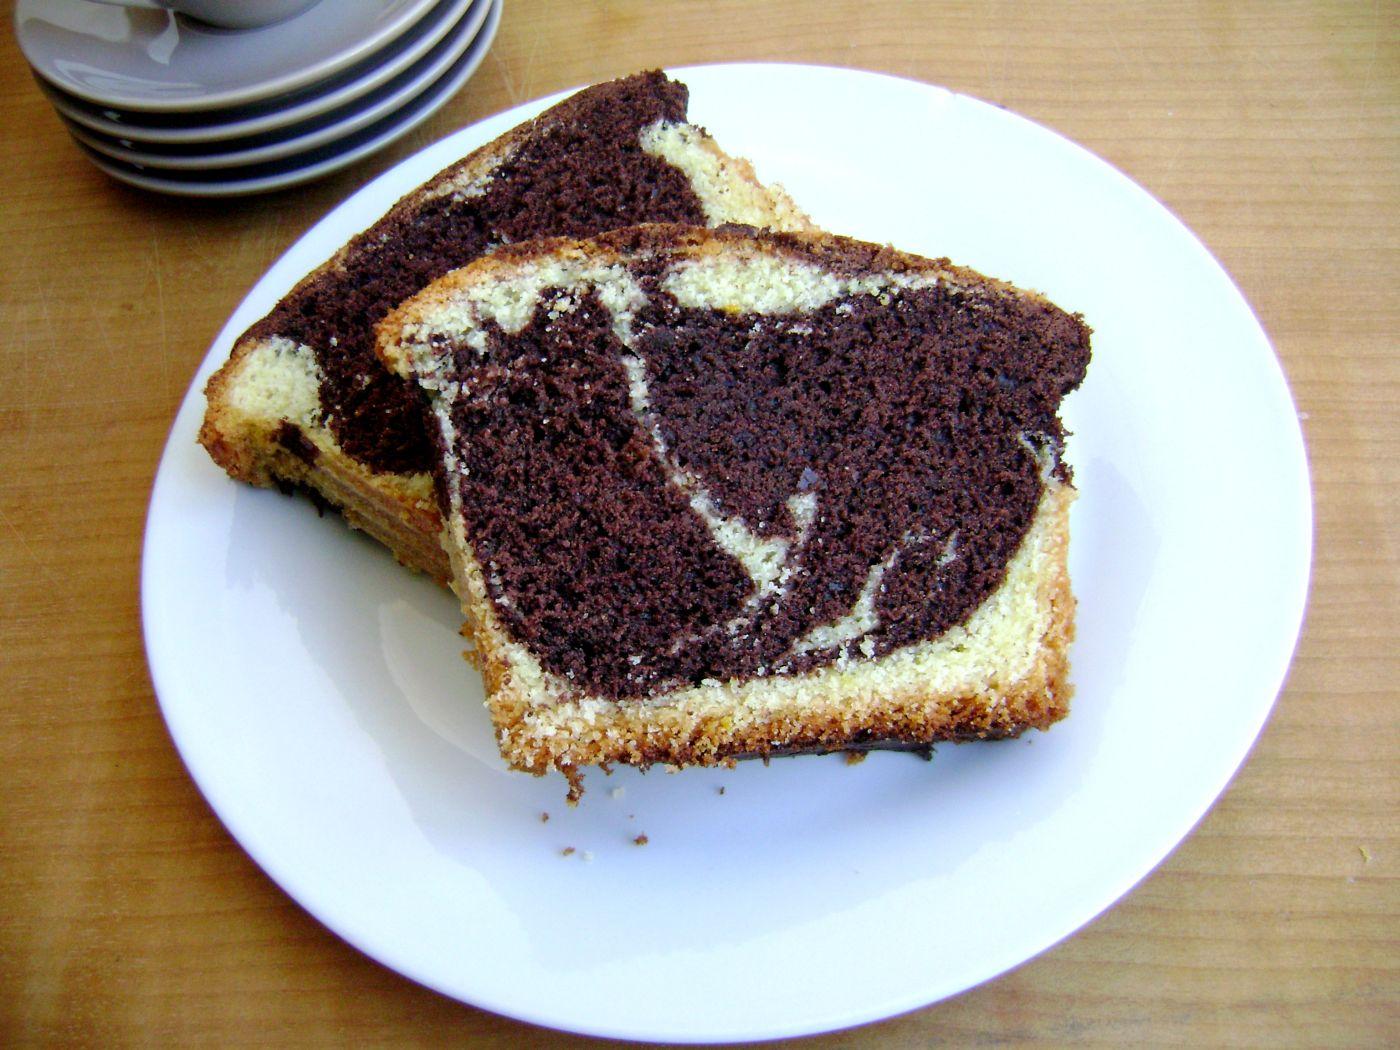 plum_cake_marmorizzato_2.jpg